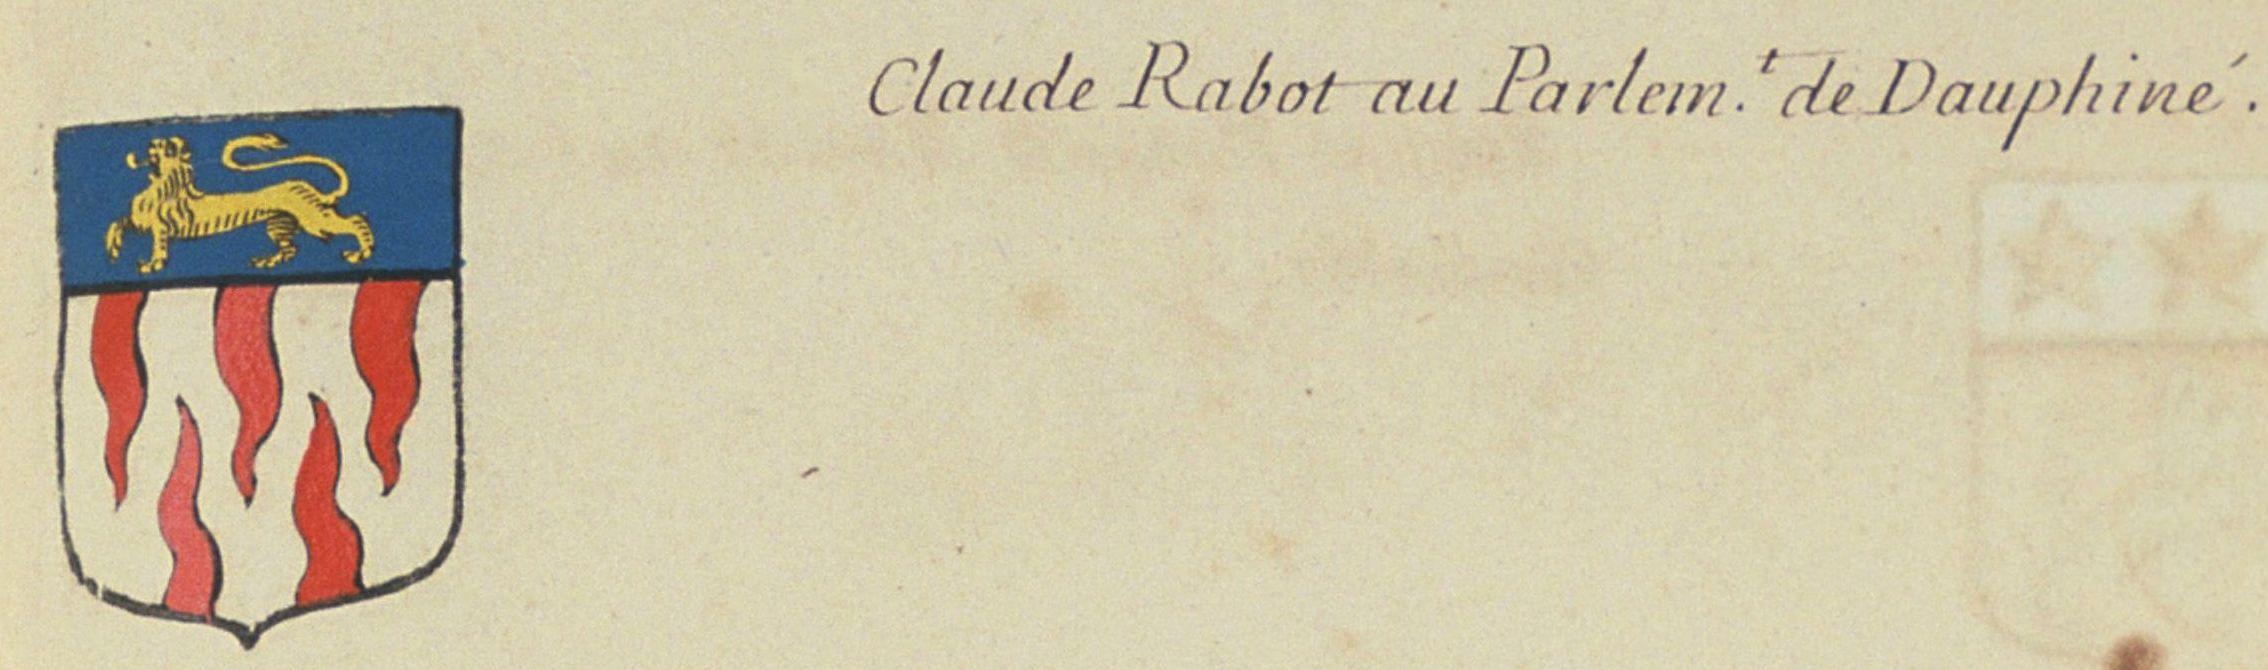 Blason des Rabot